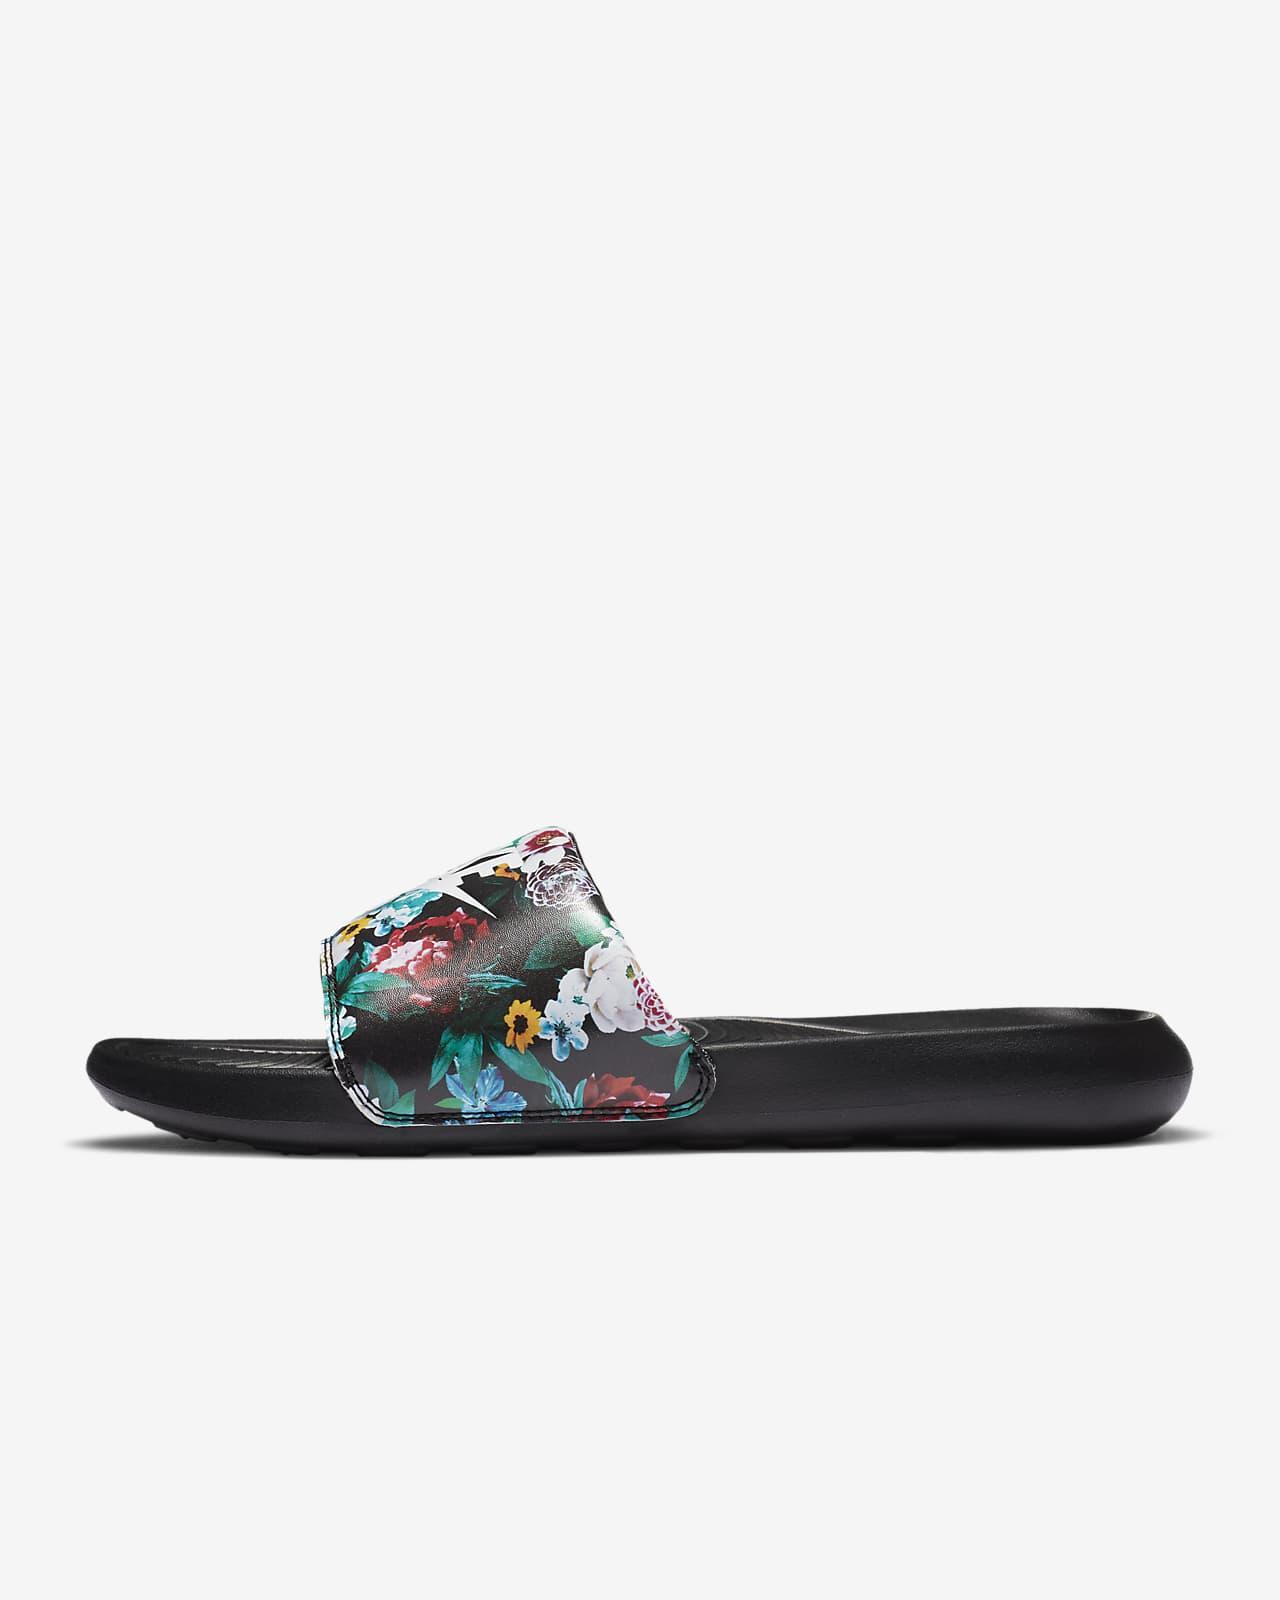 Chancla estampada para mujer Nike Victori One